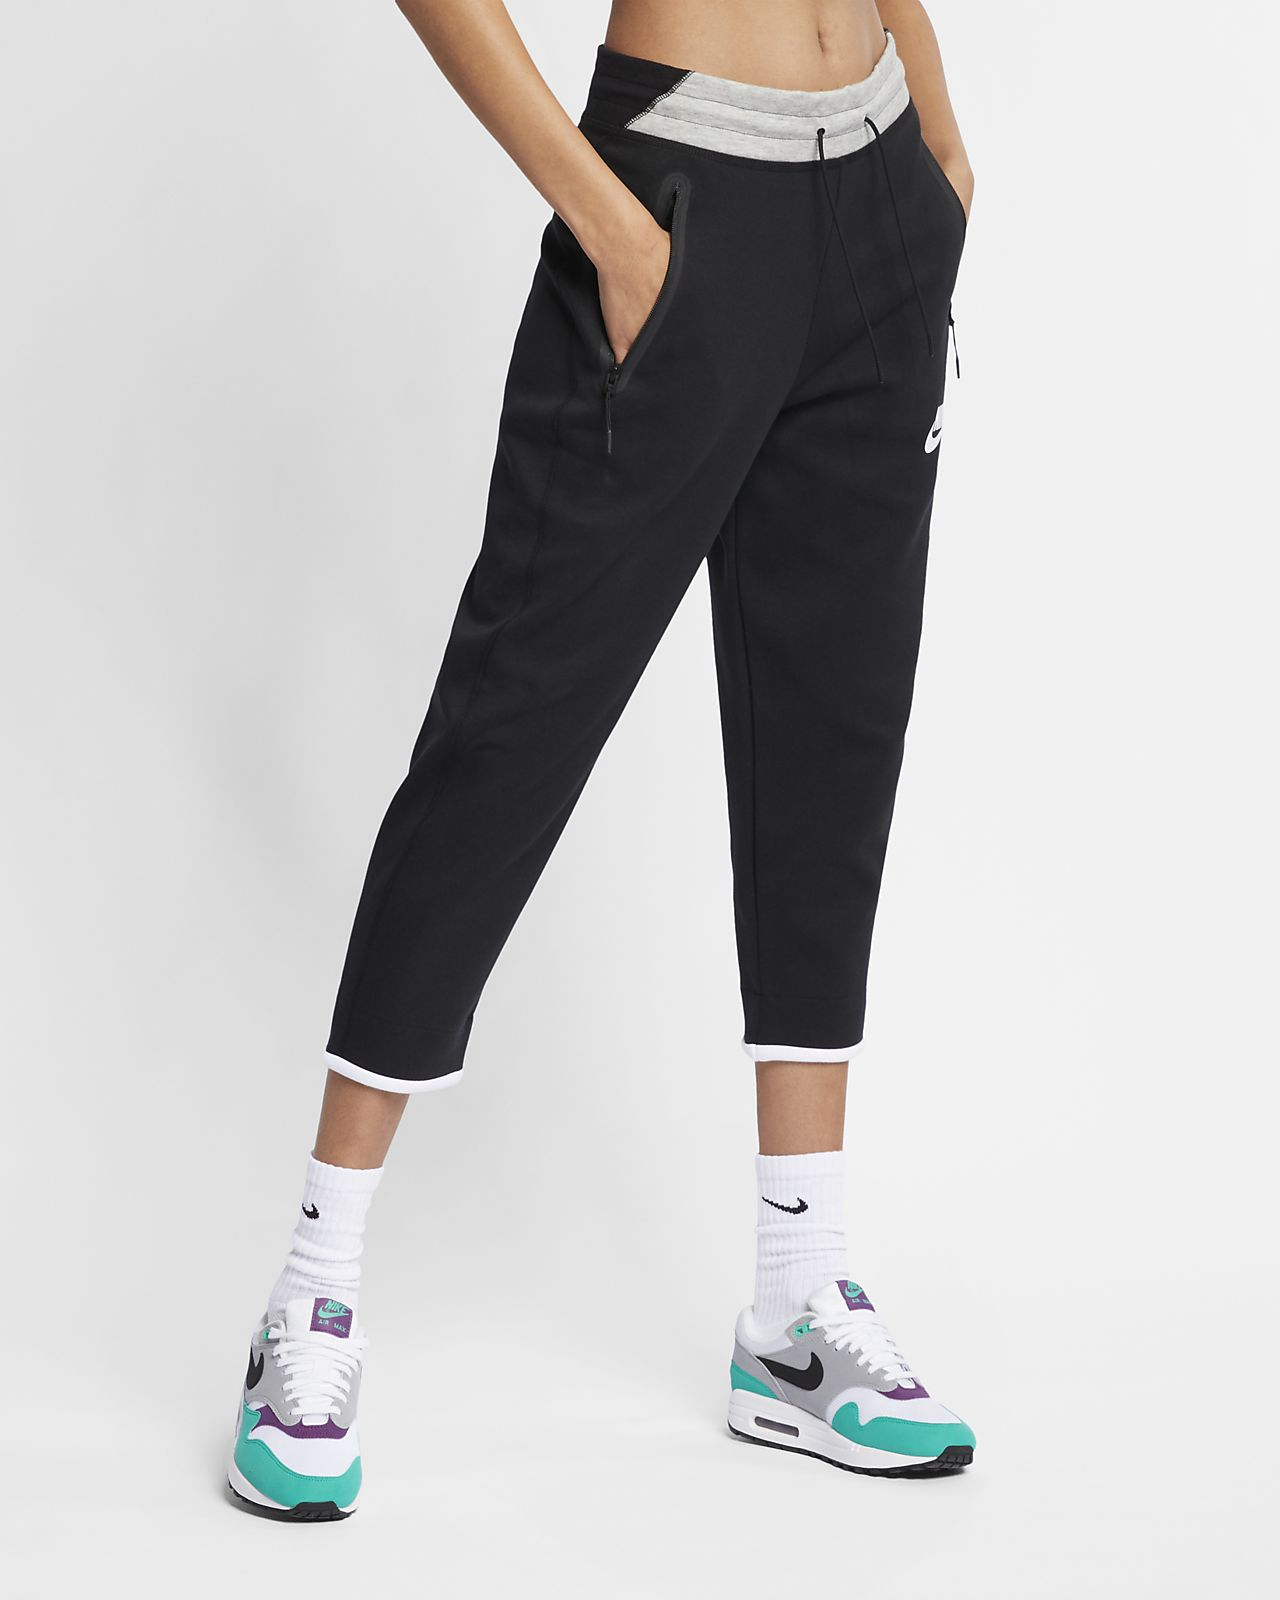 pantalon noir nike femme